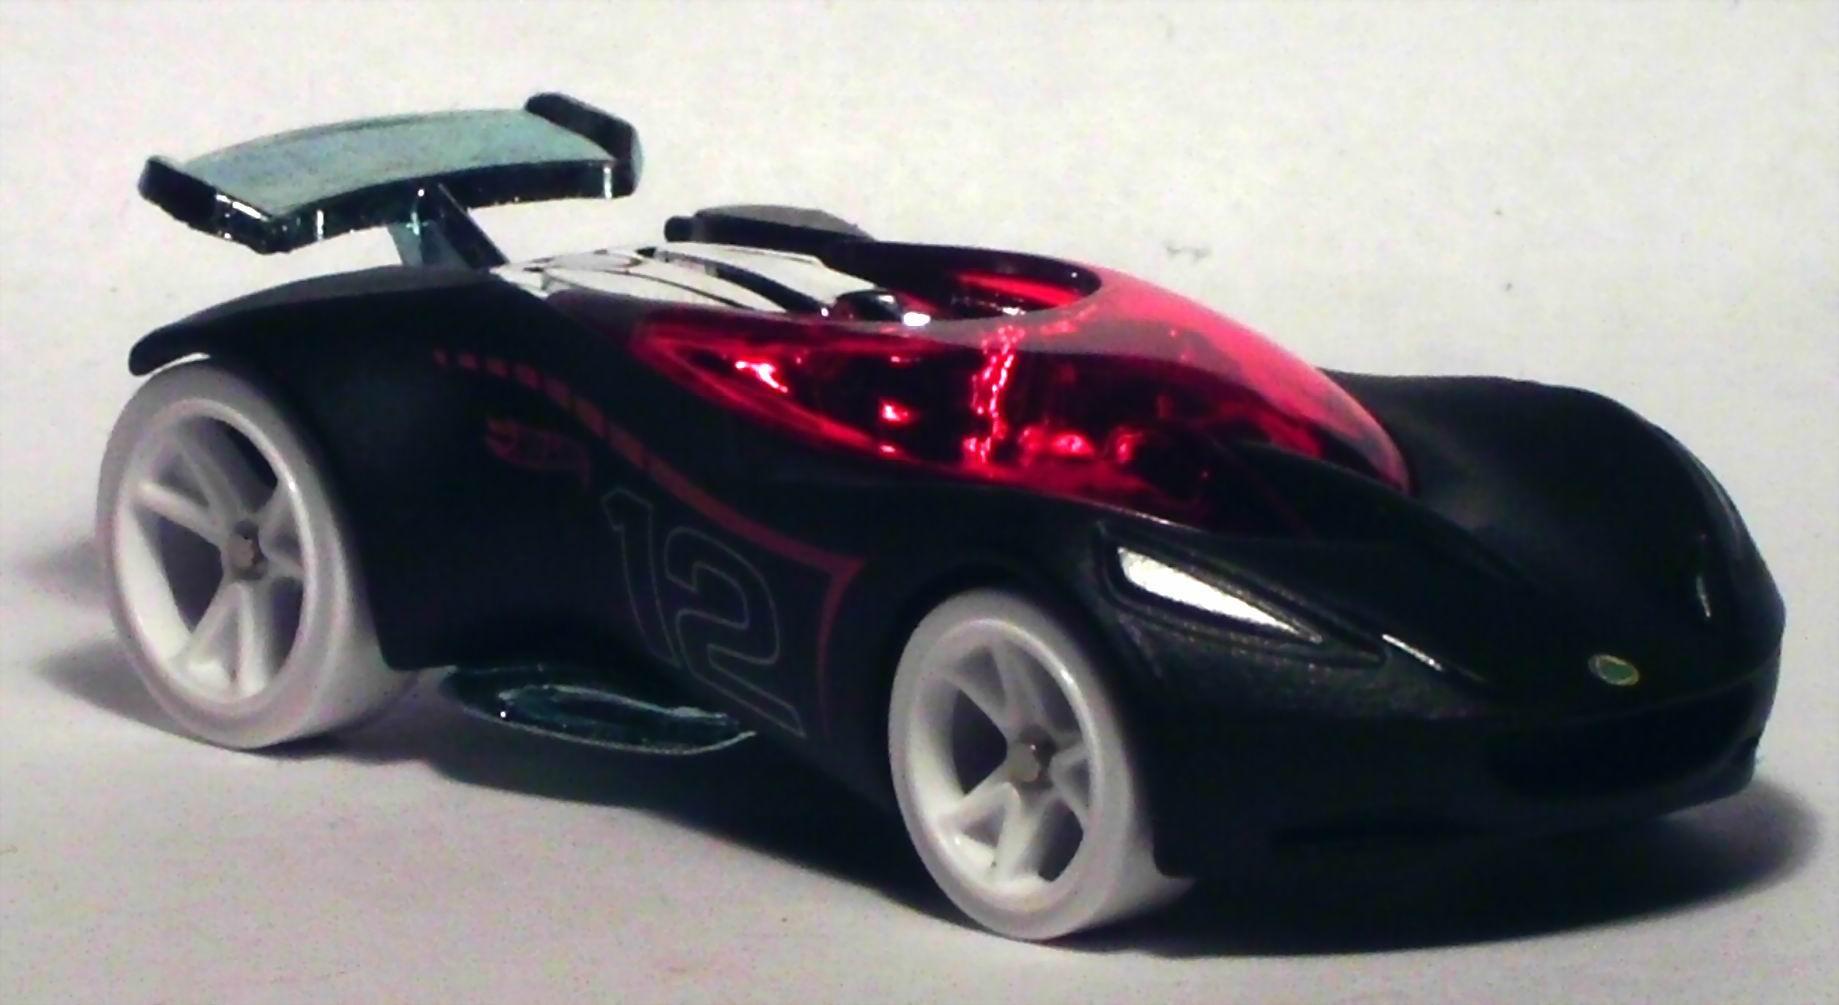 image - team hot wheels hsw lotus concept 2012 | hot wheels wiki